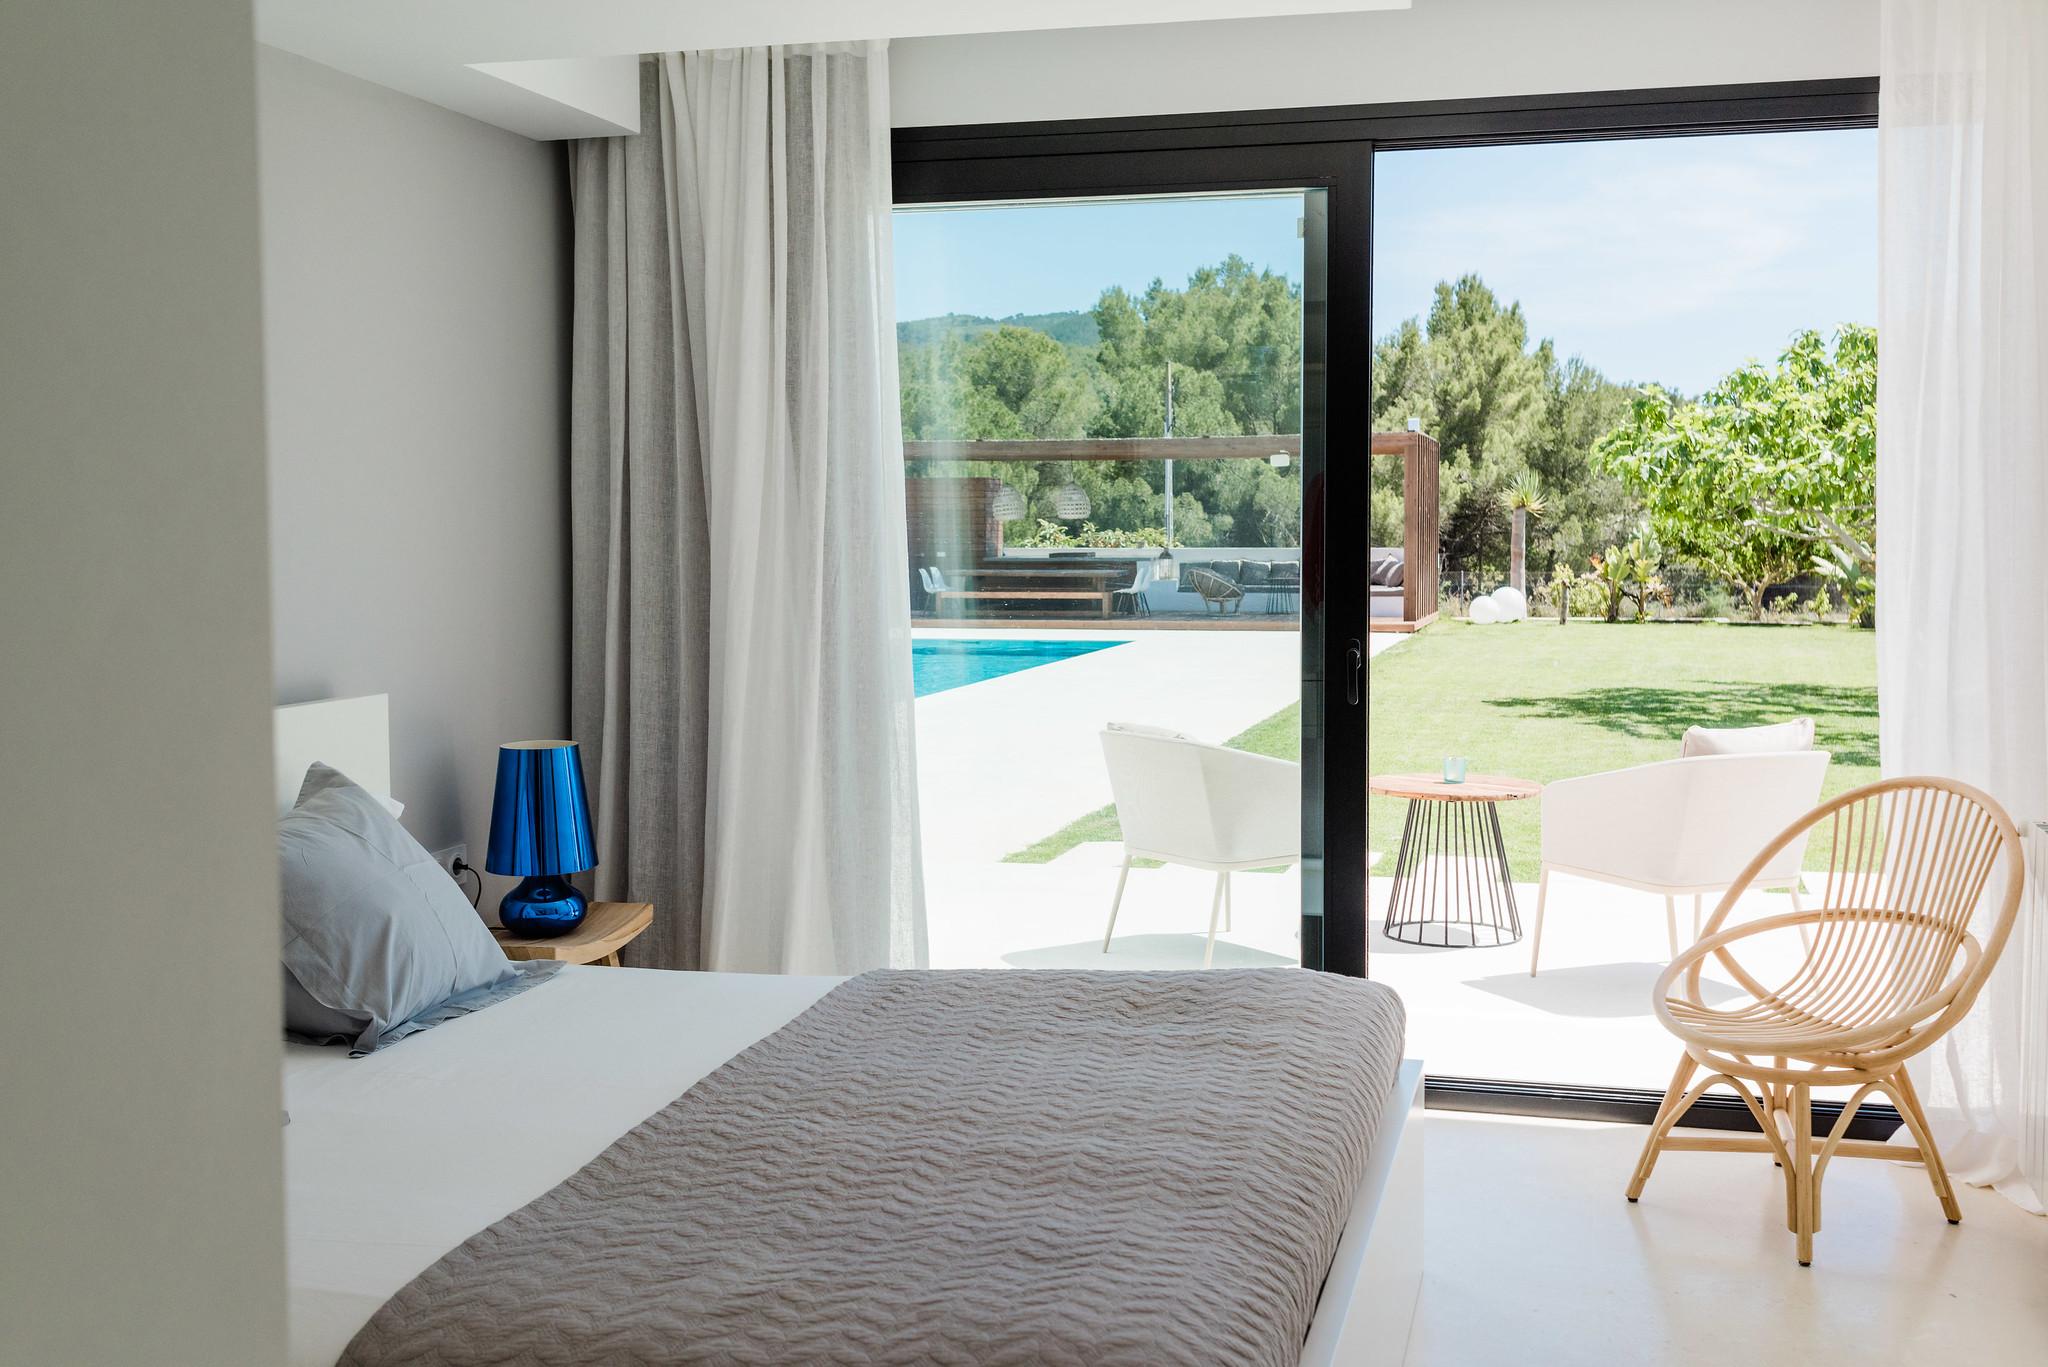 https://www.white-ibiza.com/wp-content/uploads/2020/06/white-ibiza-villas-can-carmen-interior-bedroom3.jpg